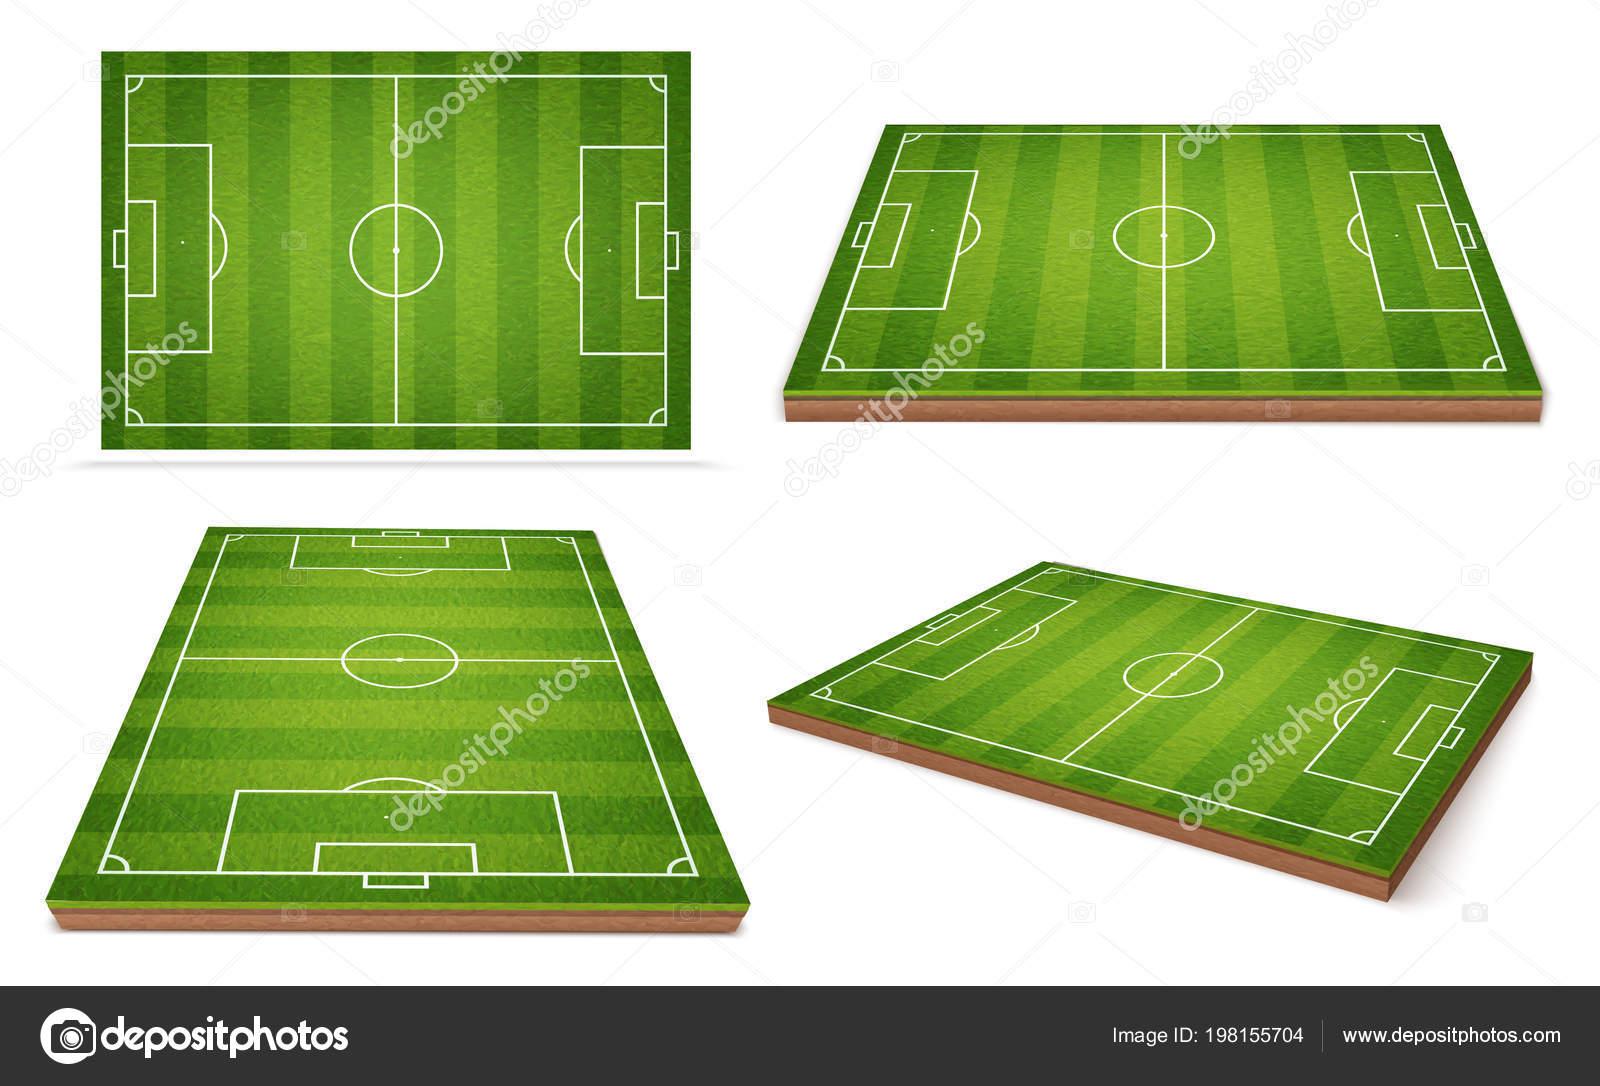 Fussball Feld Unterschiedliche Positionen Stockvektor